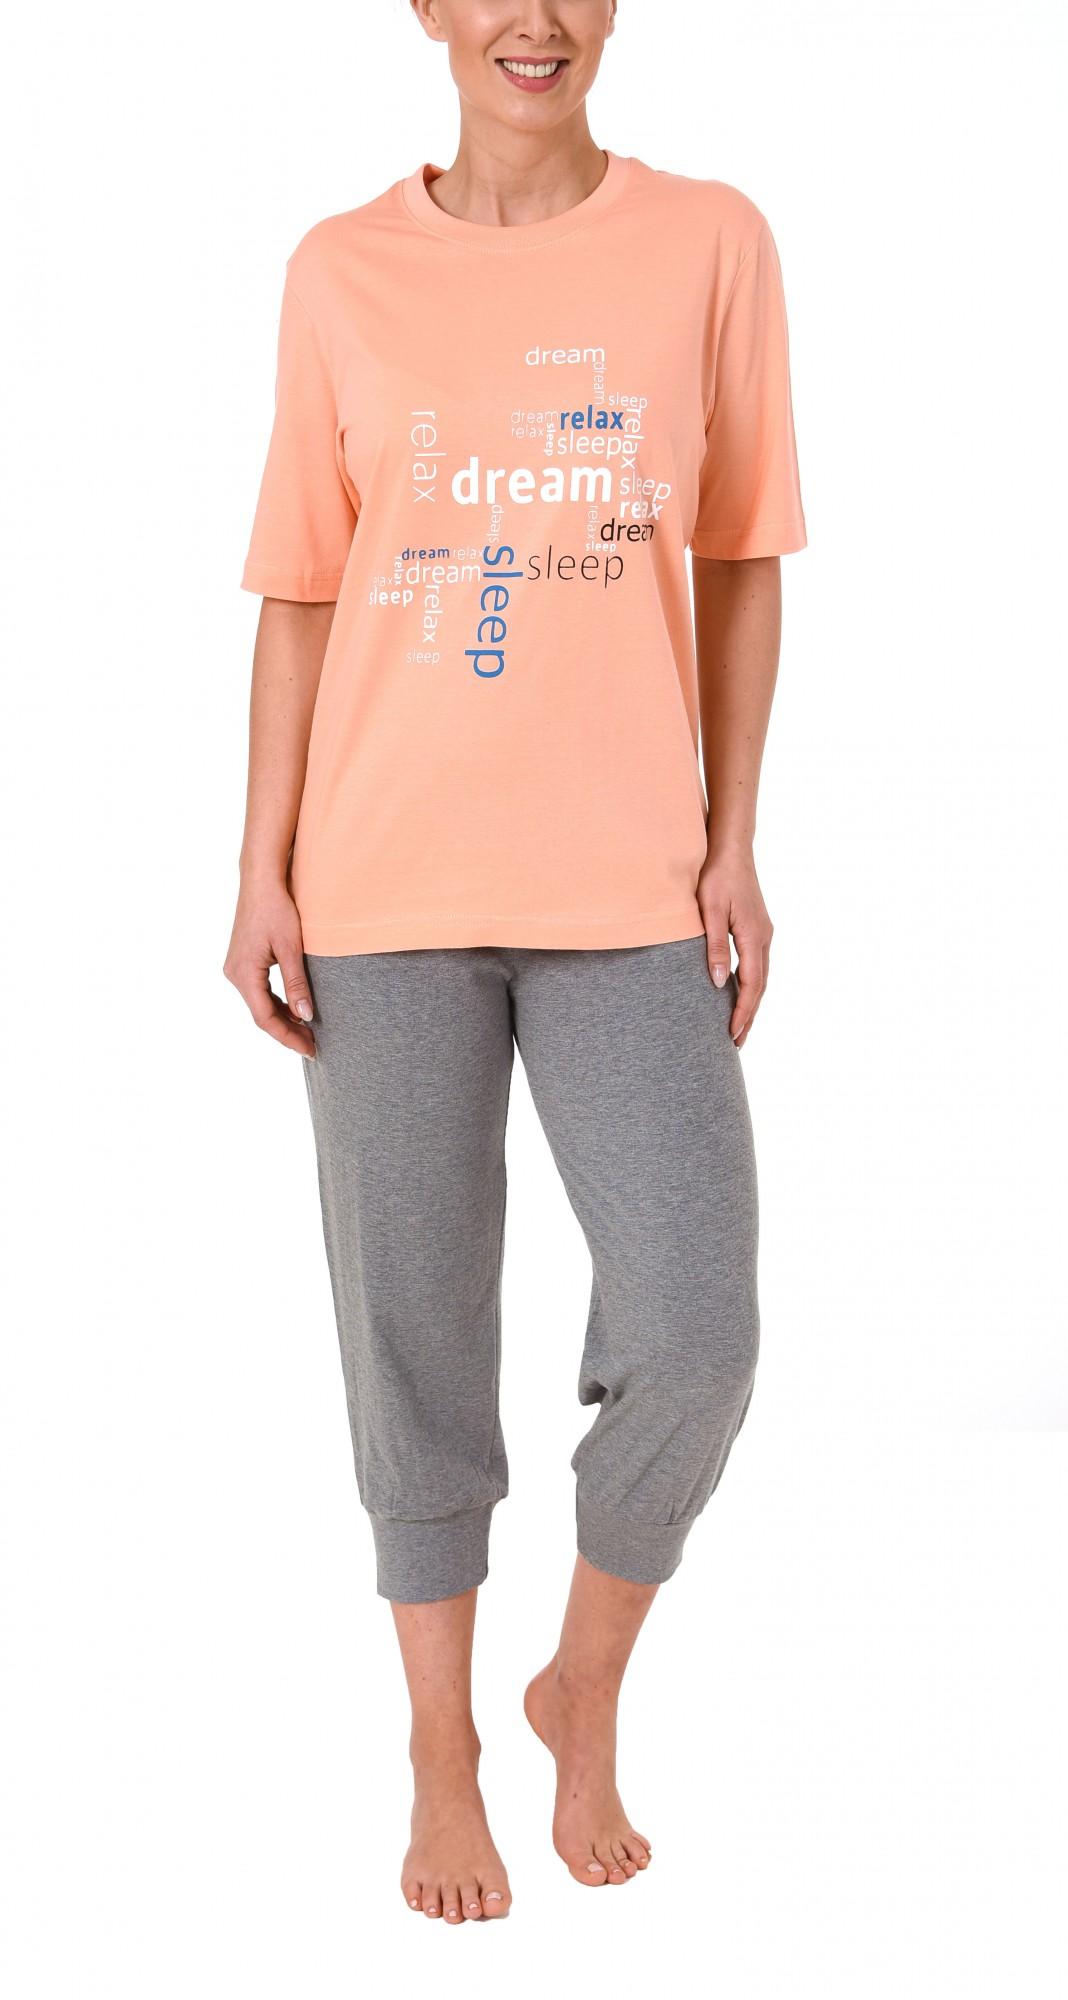 Damen Capri Pyjama 7/8-lange Hose und kurzarm Oberteil – 60657 – Bild 2